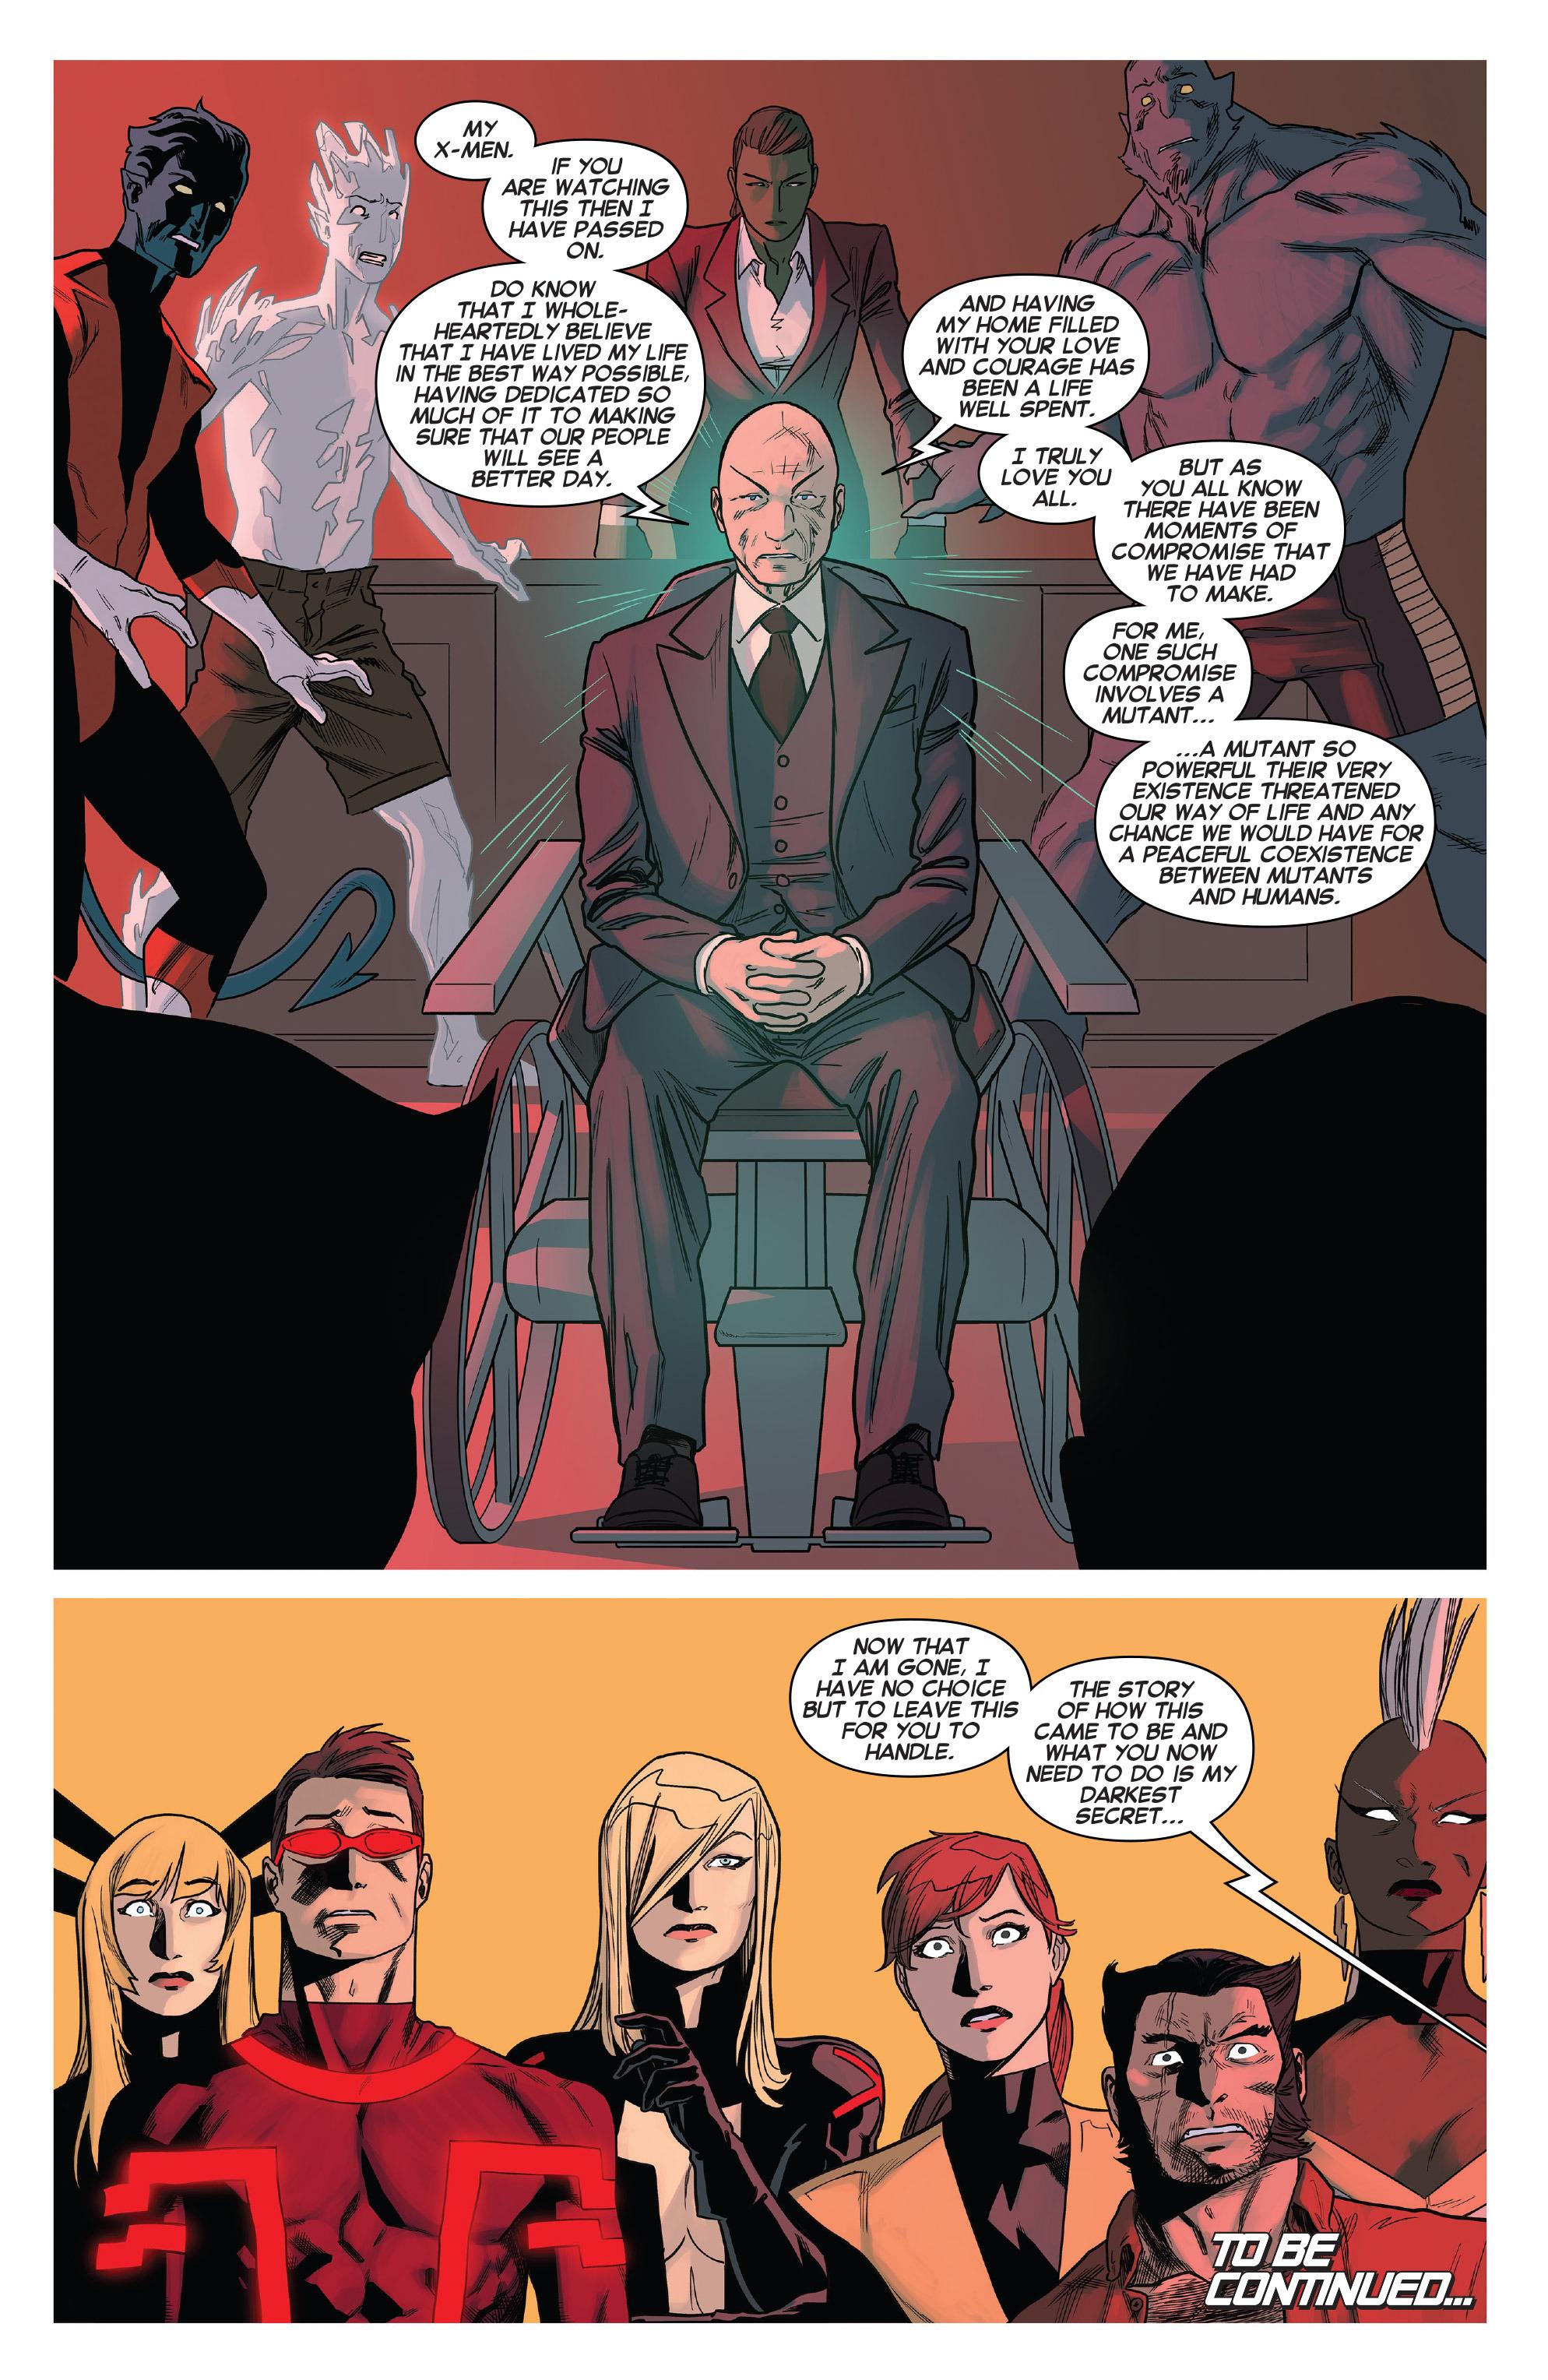 Read online Uncanny X-Men (2013) comic -  Issue # _TPB 4 - vs. S.H.I.E.L.D - 117